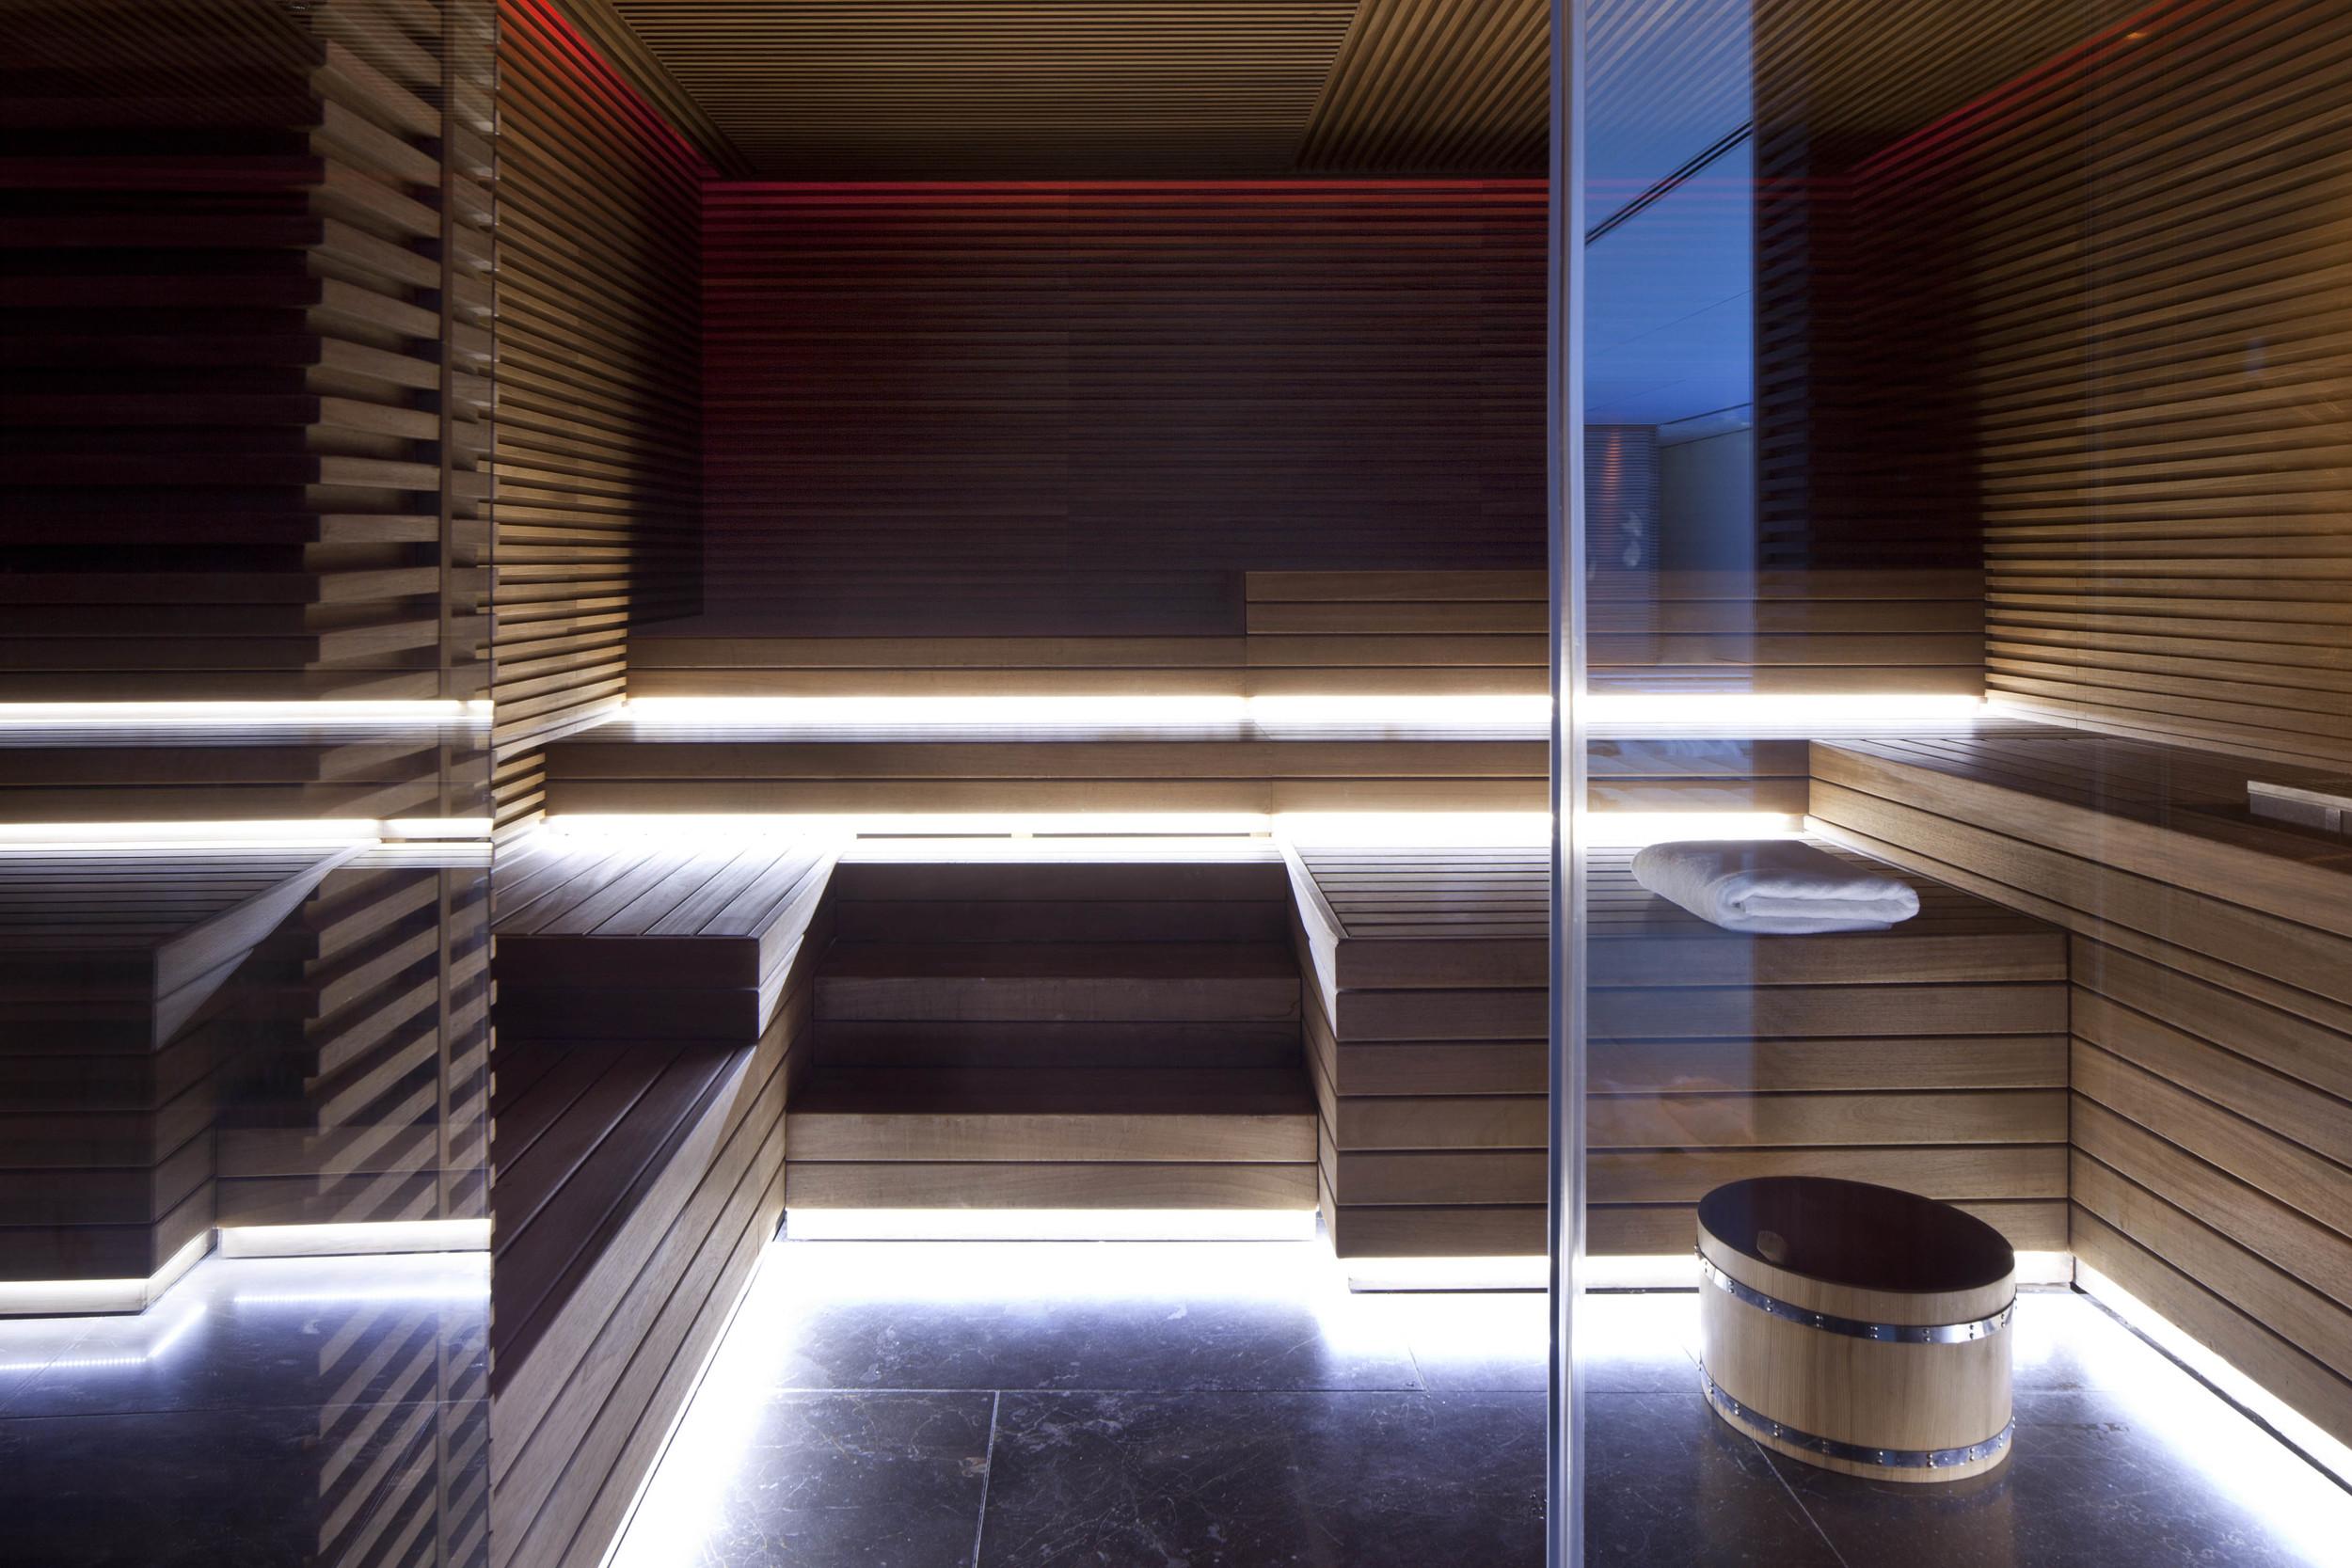 CONSERVATORIUM_HOTEL_AKASHA_014.jpg